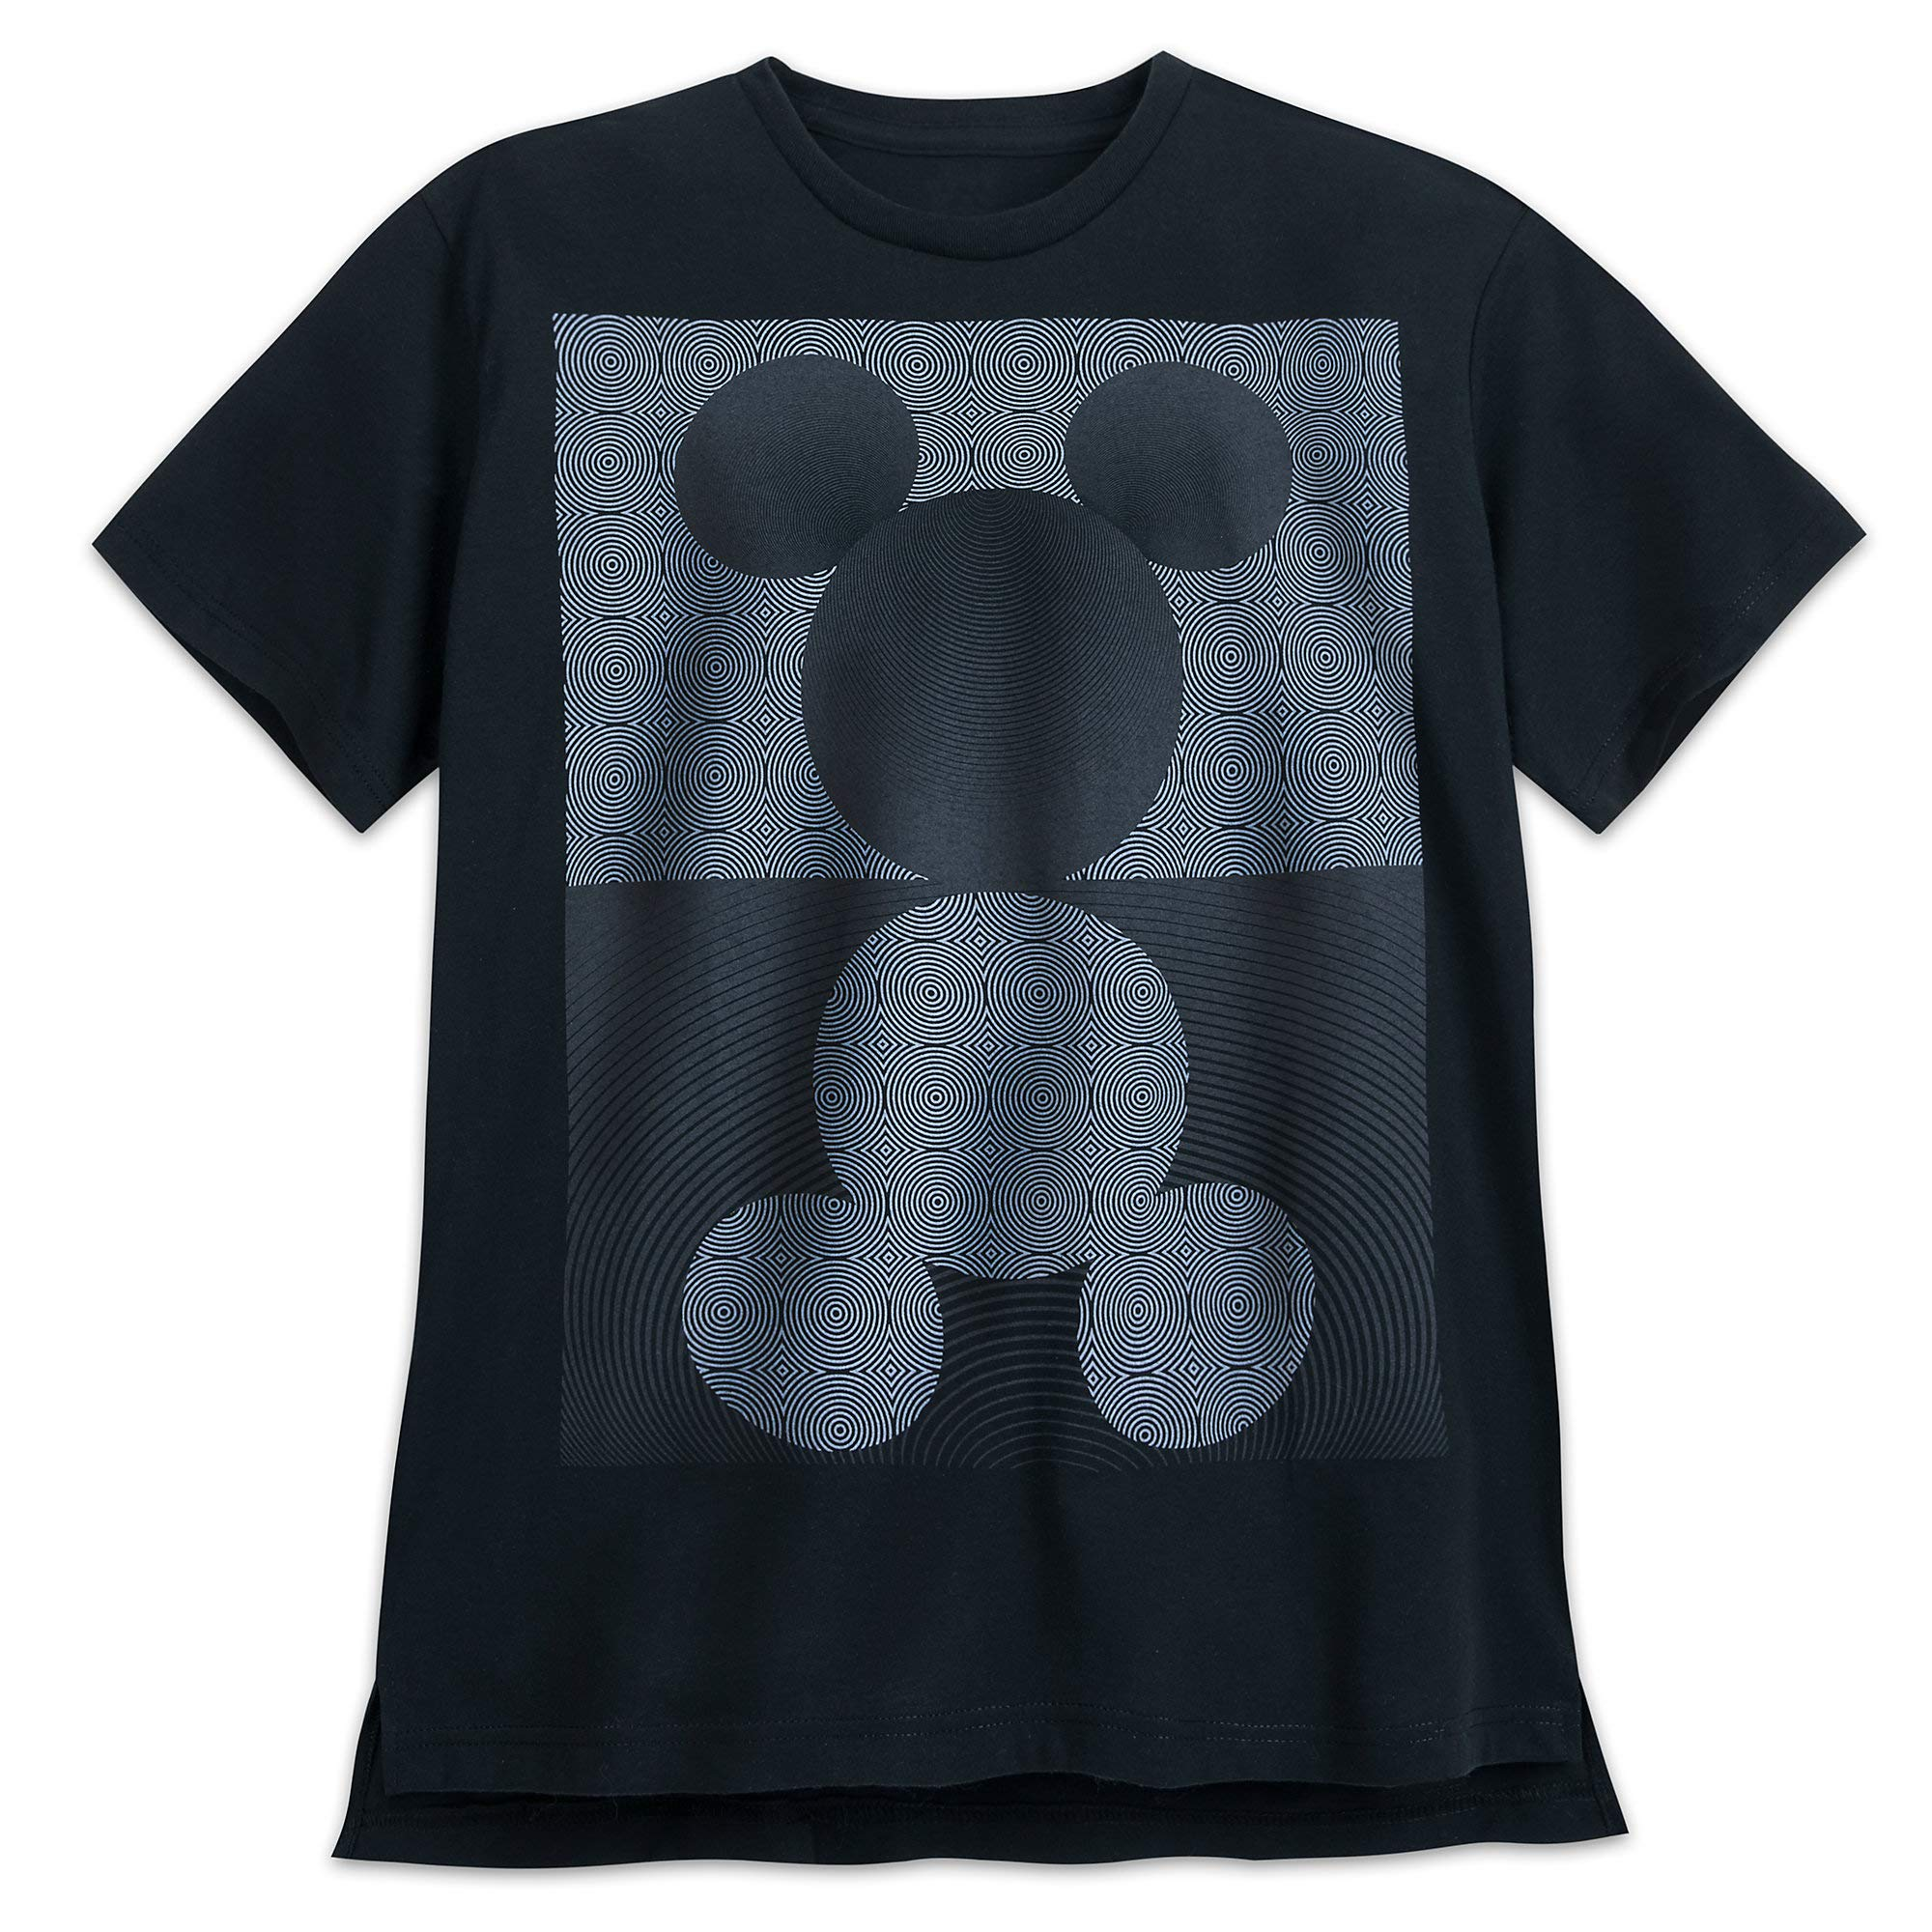 Mouse Mirror Image T Shirt Multi 1905